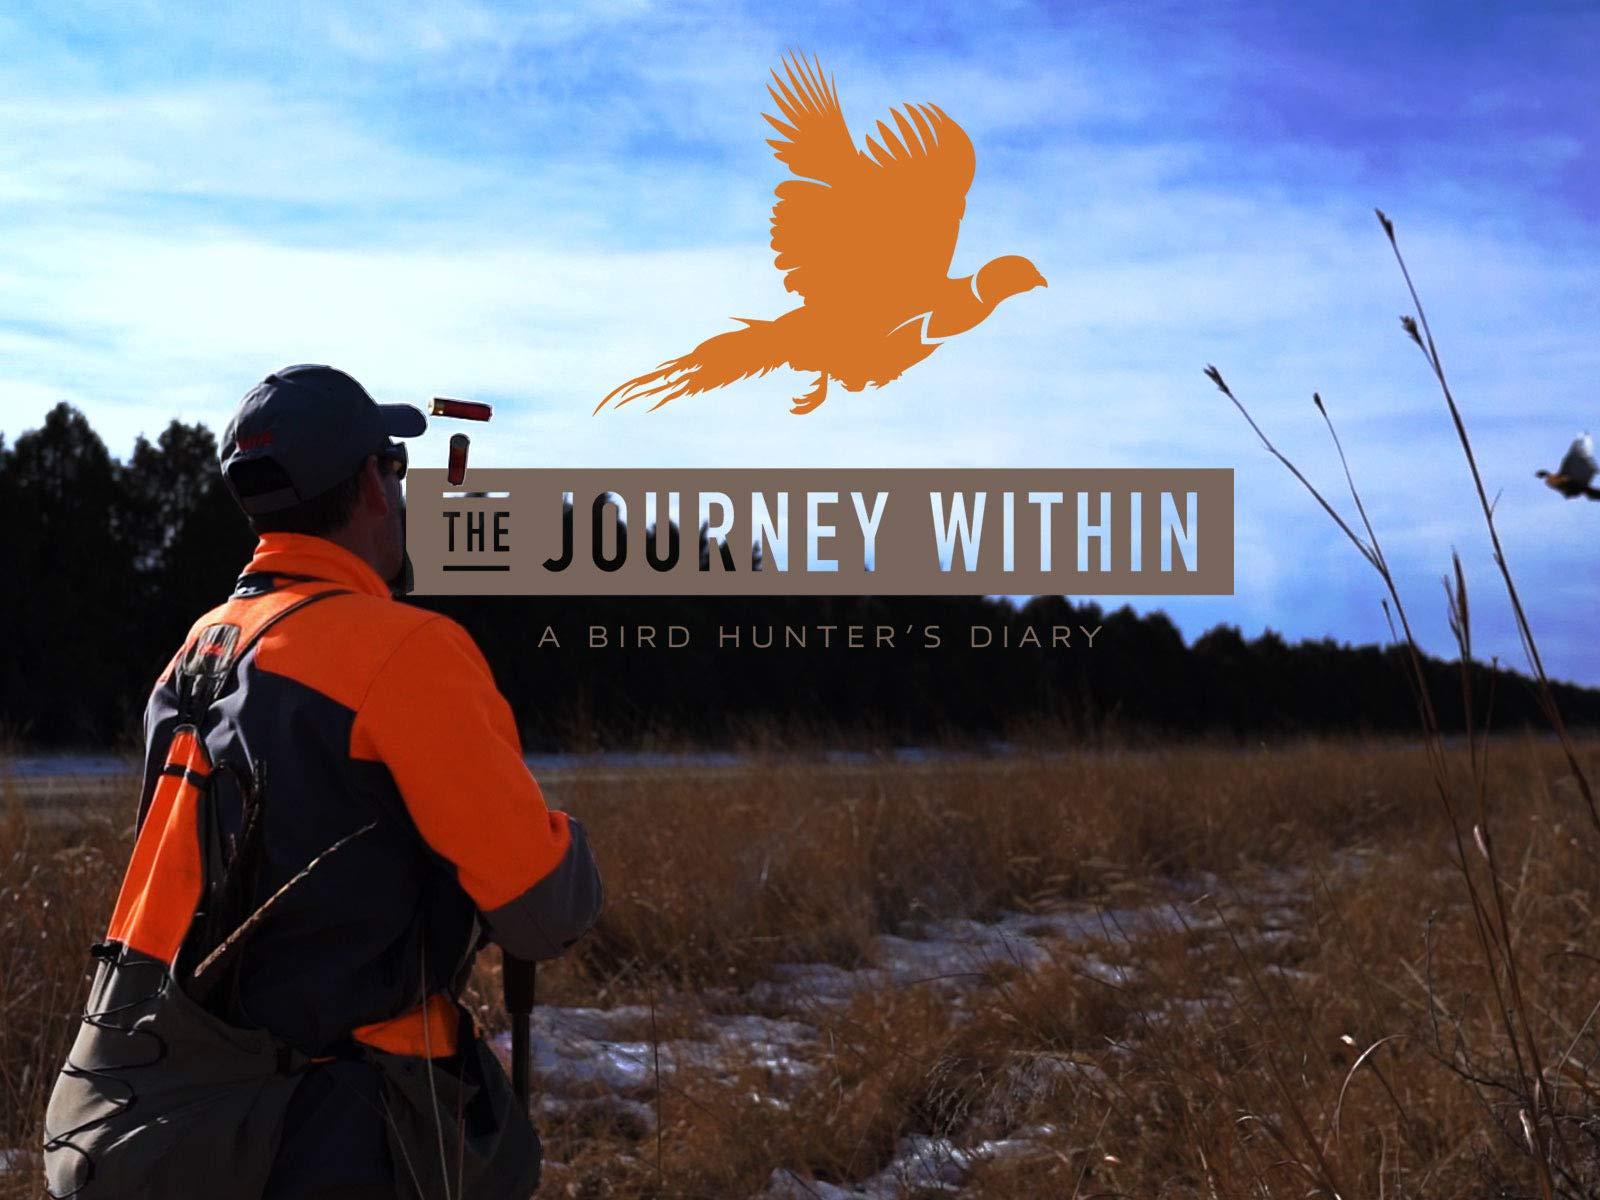 Clip: The Journey Within - A Bird Hunter's Diary - Season 1